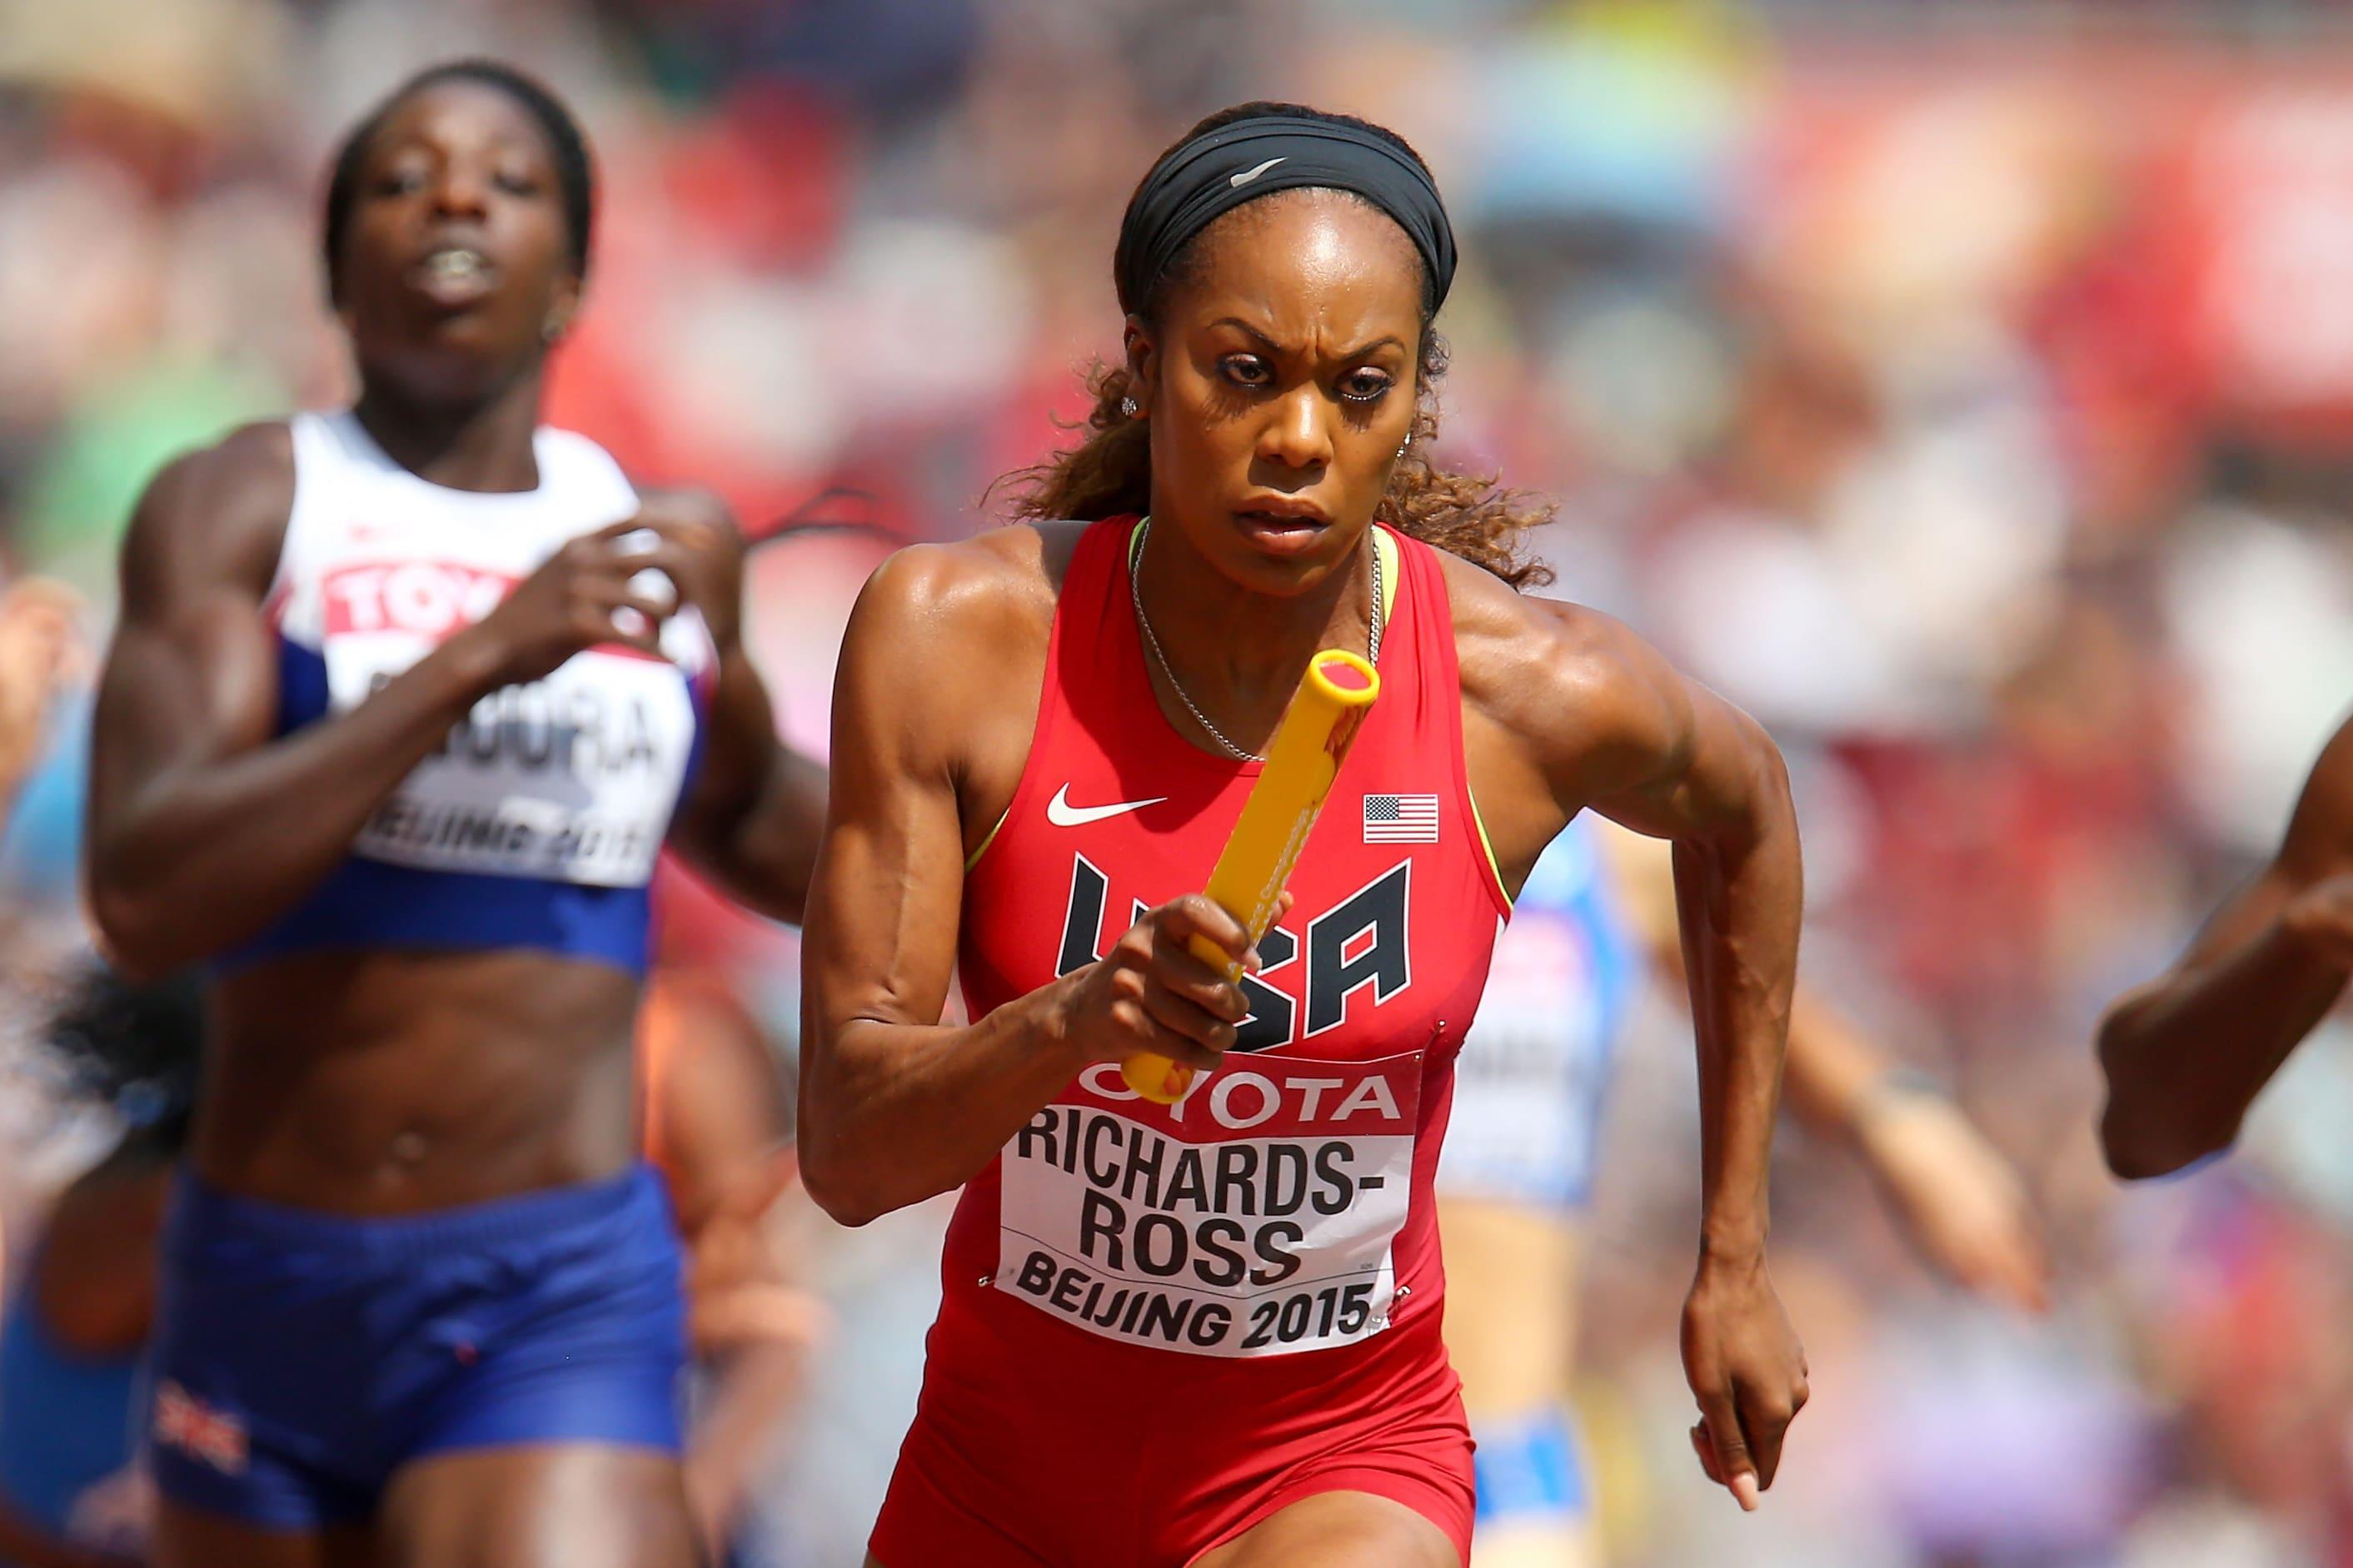 Sanya Richards-Ross 5 Olympic medals Sanya Richards-Ross 5 Olympic medals new picture